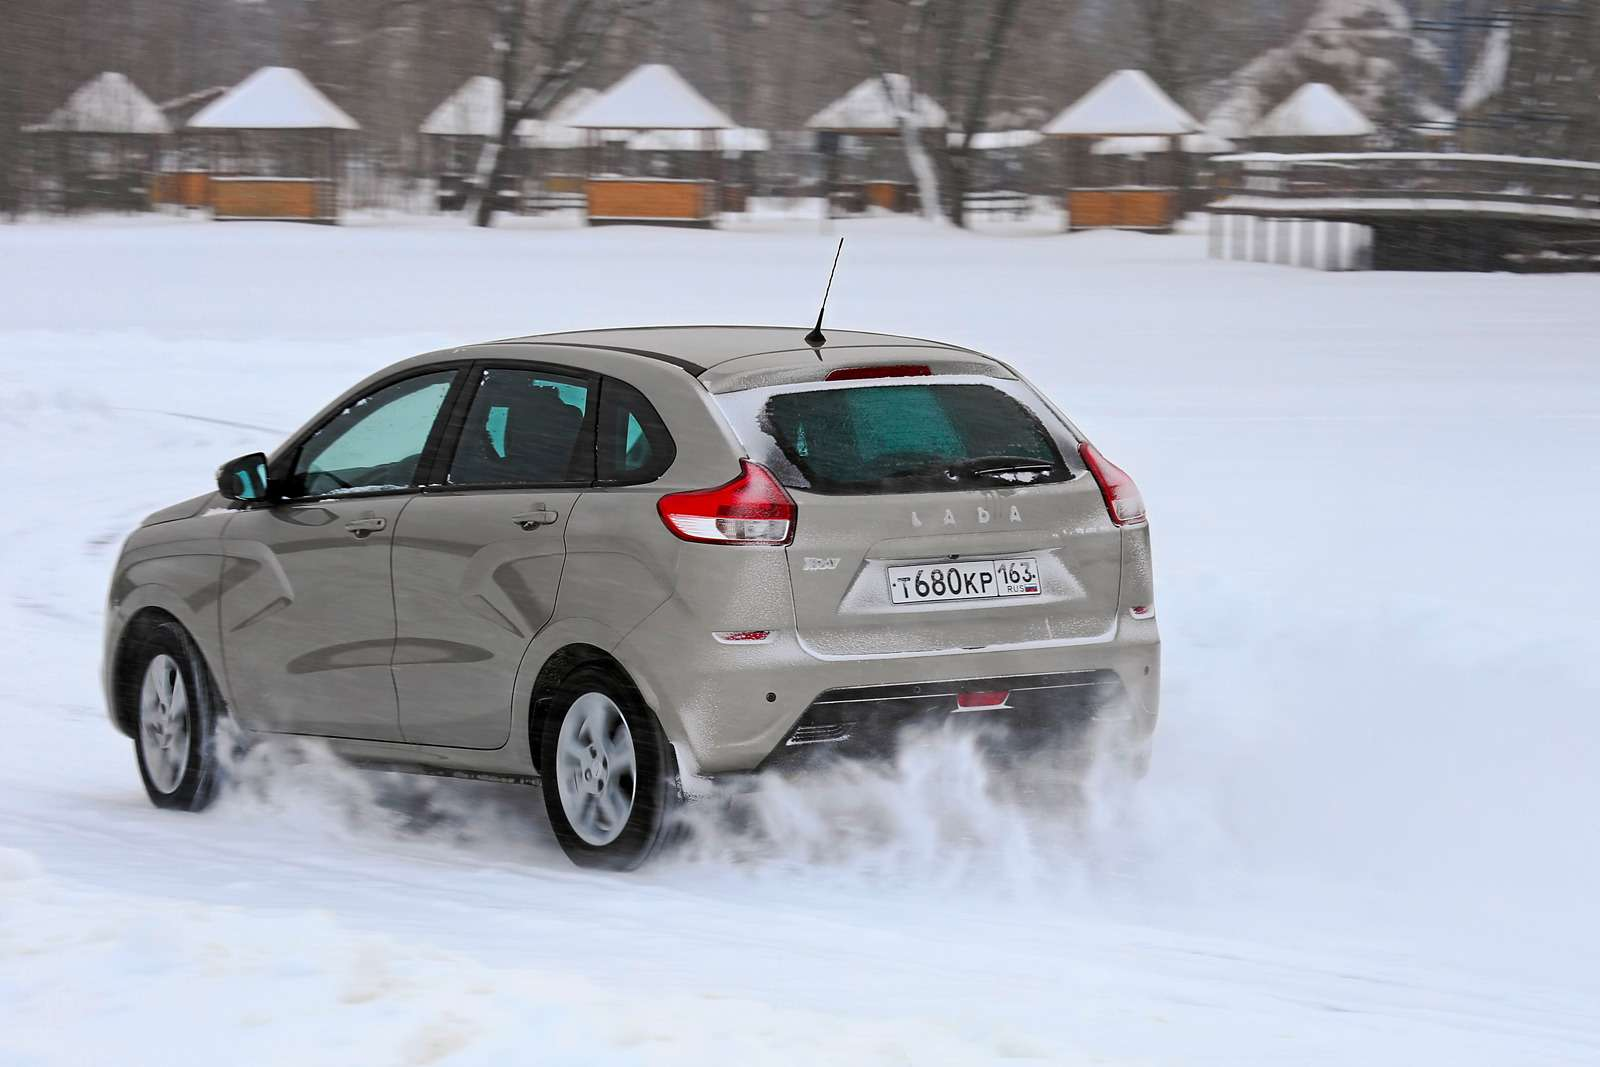 Большой зимний тест: Lada Vesta, Lada XRAY иDatsun mi-DO изпарка ЗР— фото 571451